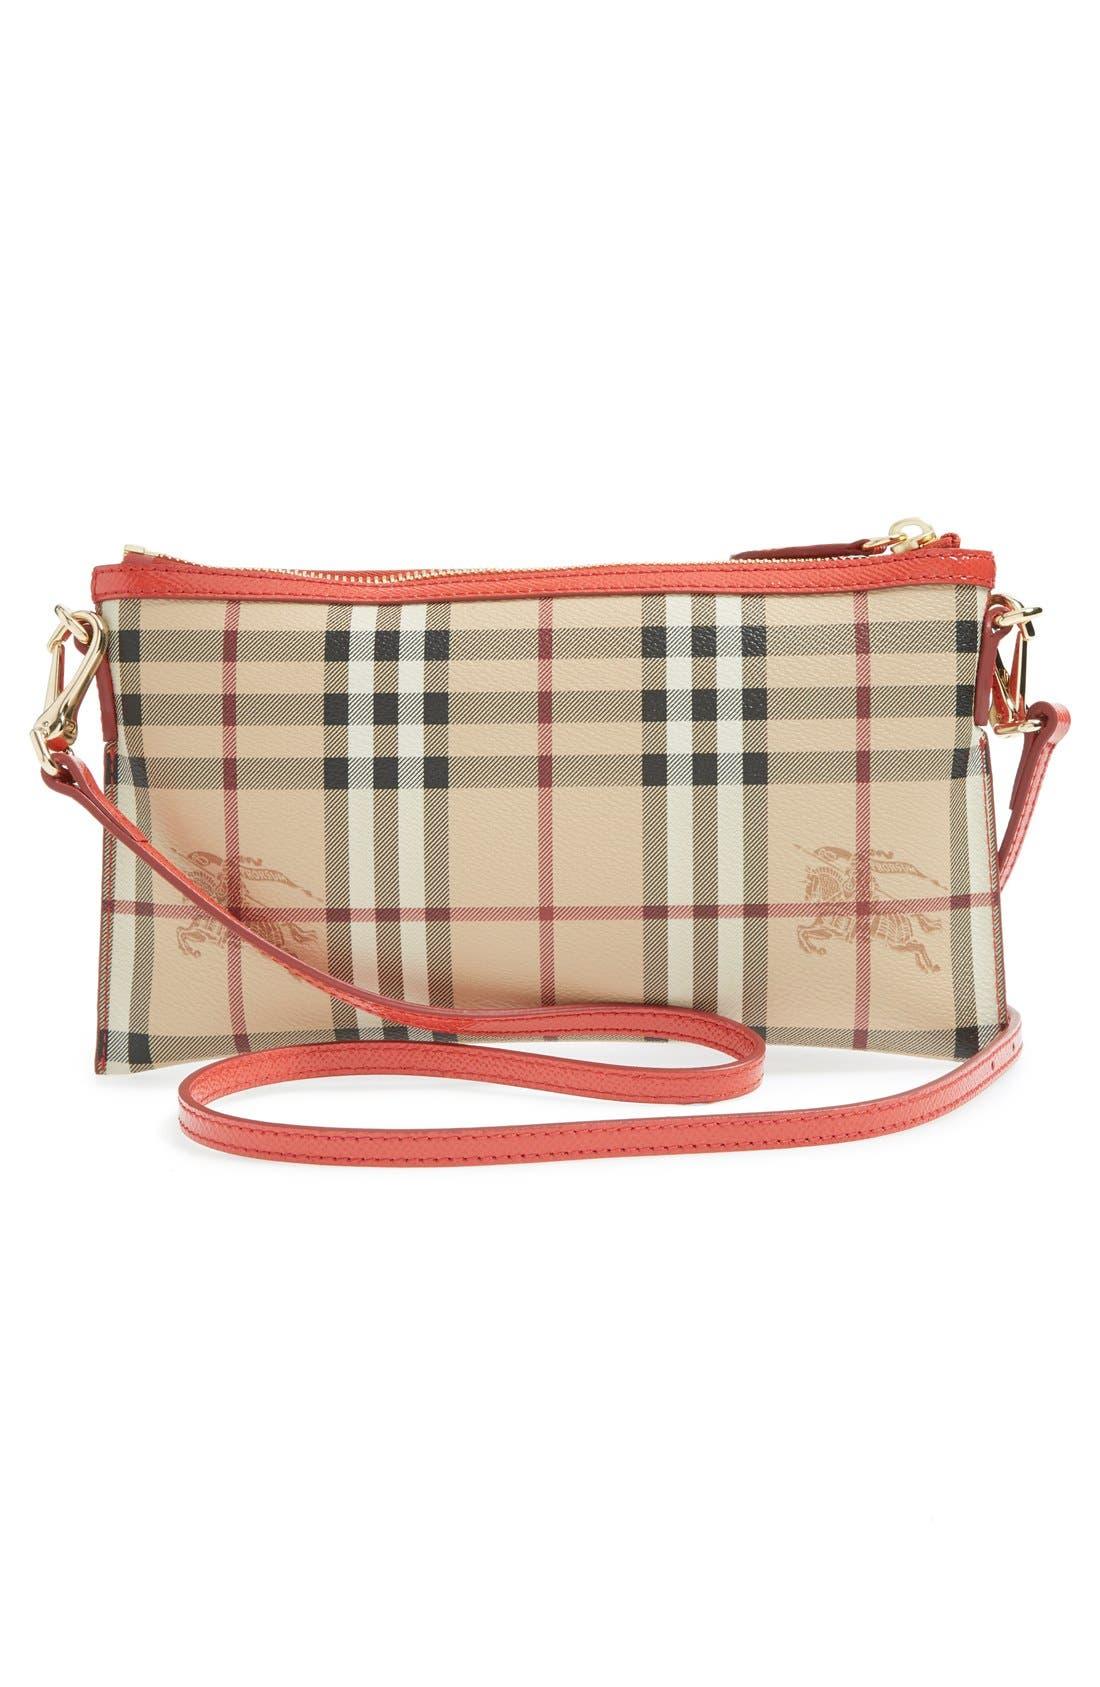 Alternate Image 3  - Burberry 'Peyton - Haymarket Check' Crossbody Bag